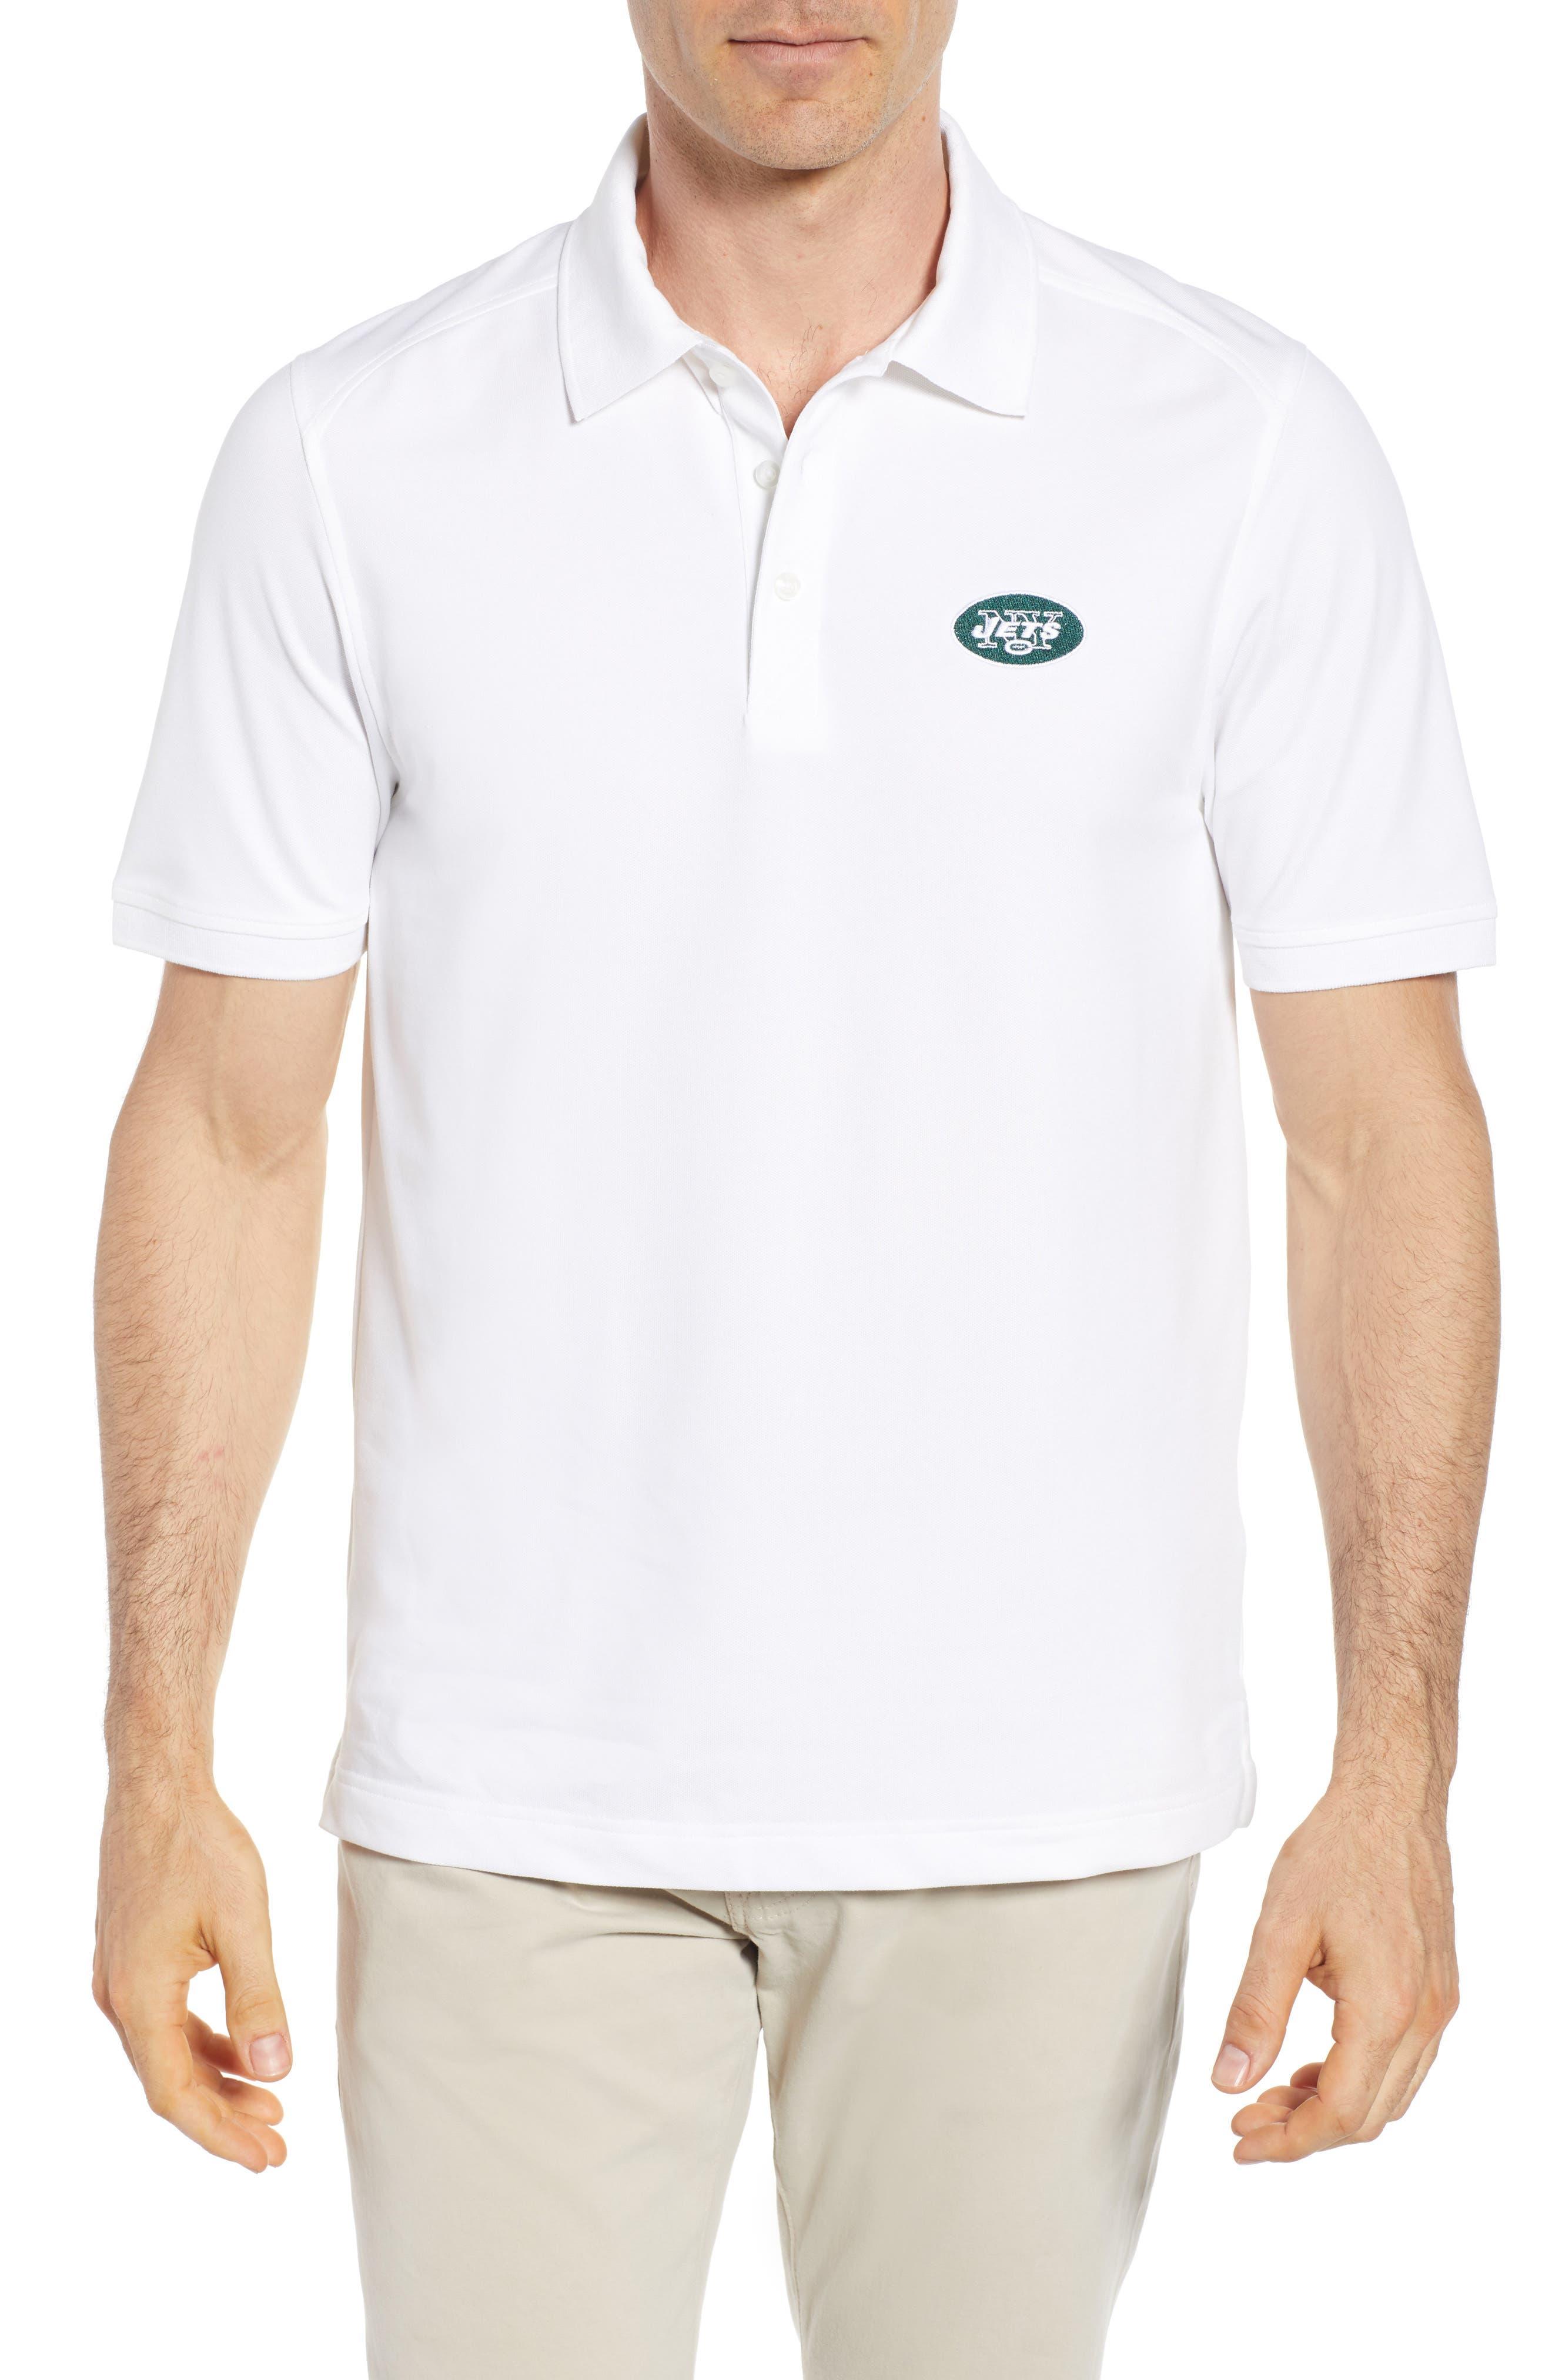 CUTTER & BUCK,                             New York Jets - Advantage Regular Fit DryTec Polo,                             Main thumbnail 1, color,                             100